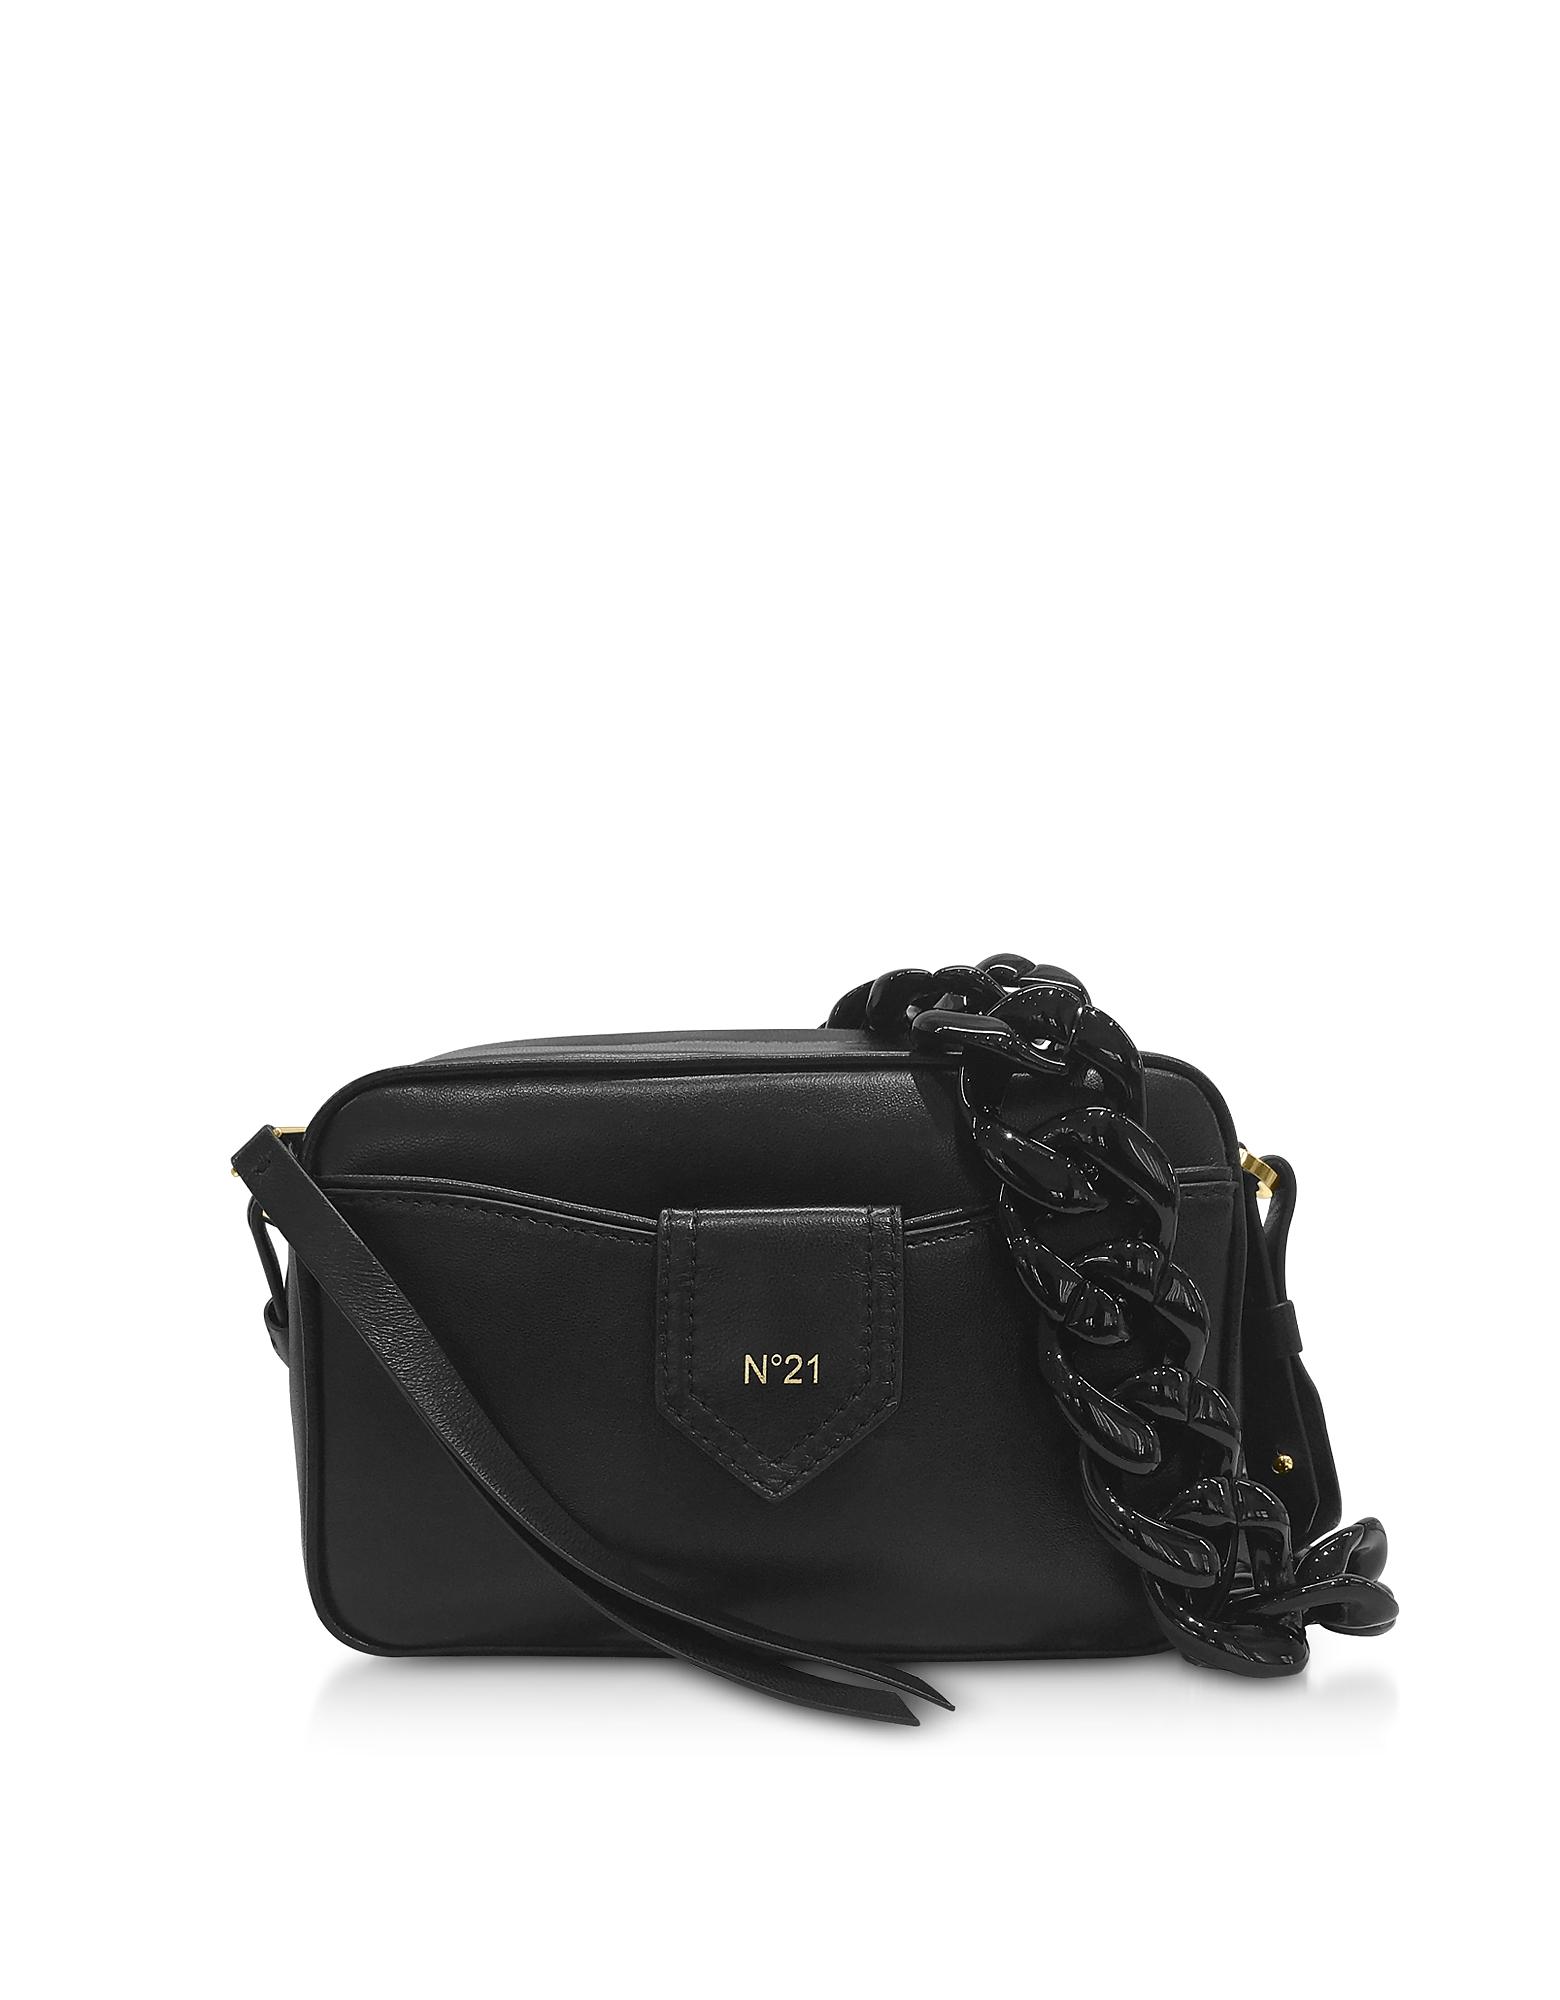 N°21 Handbags, Black Leather Camera Bag